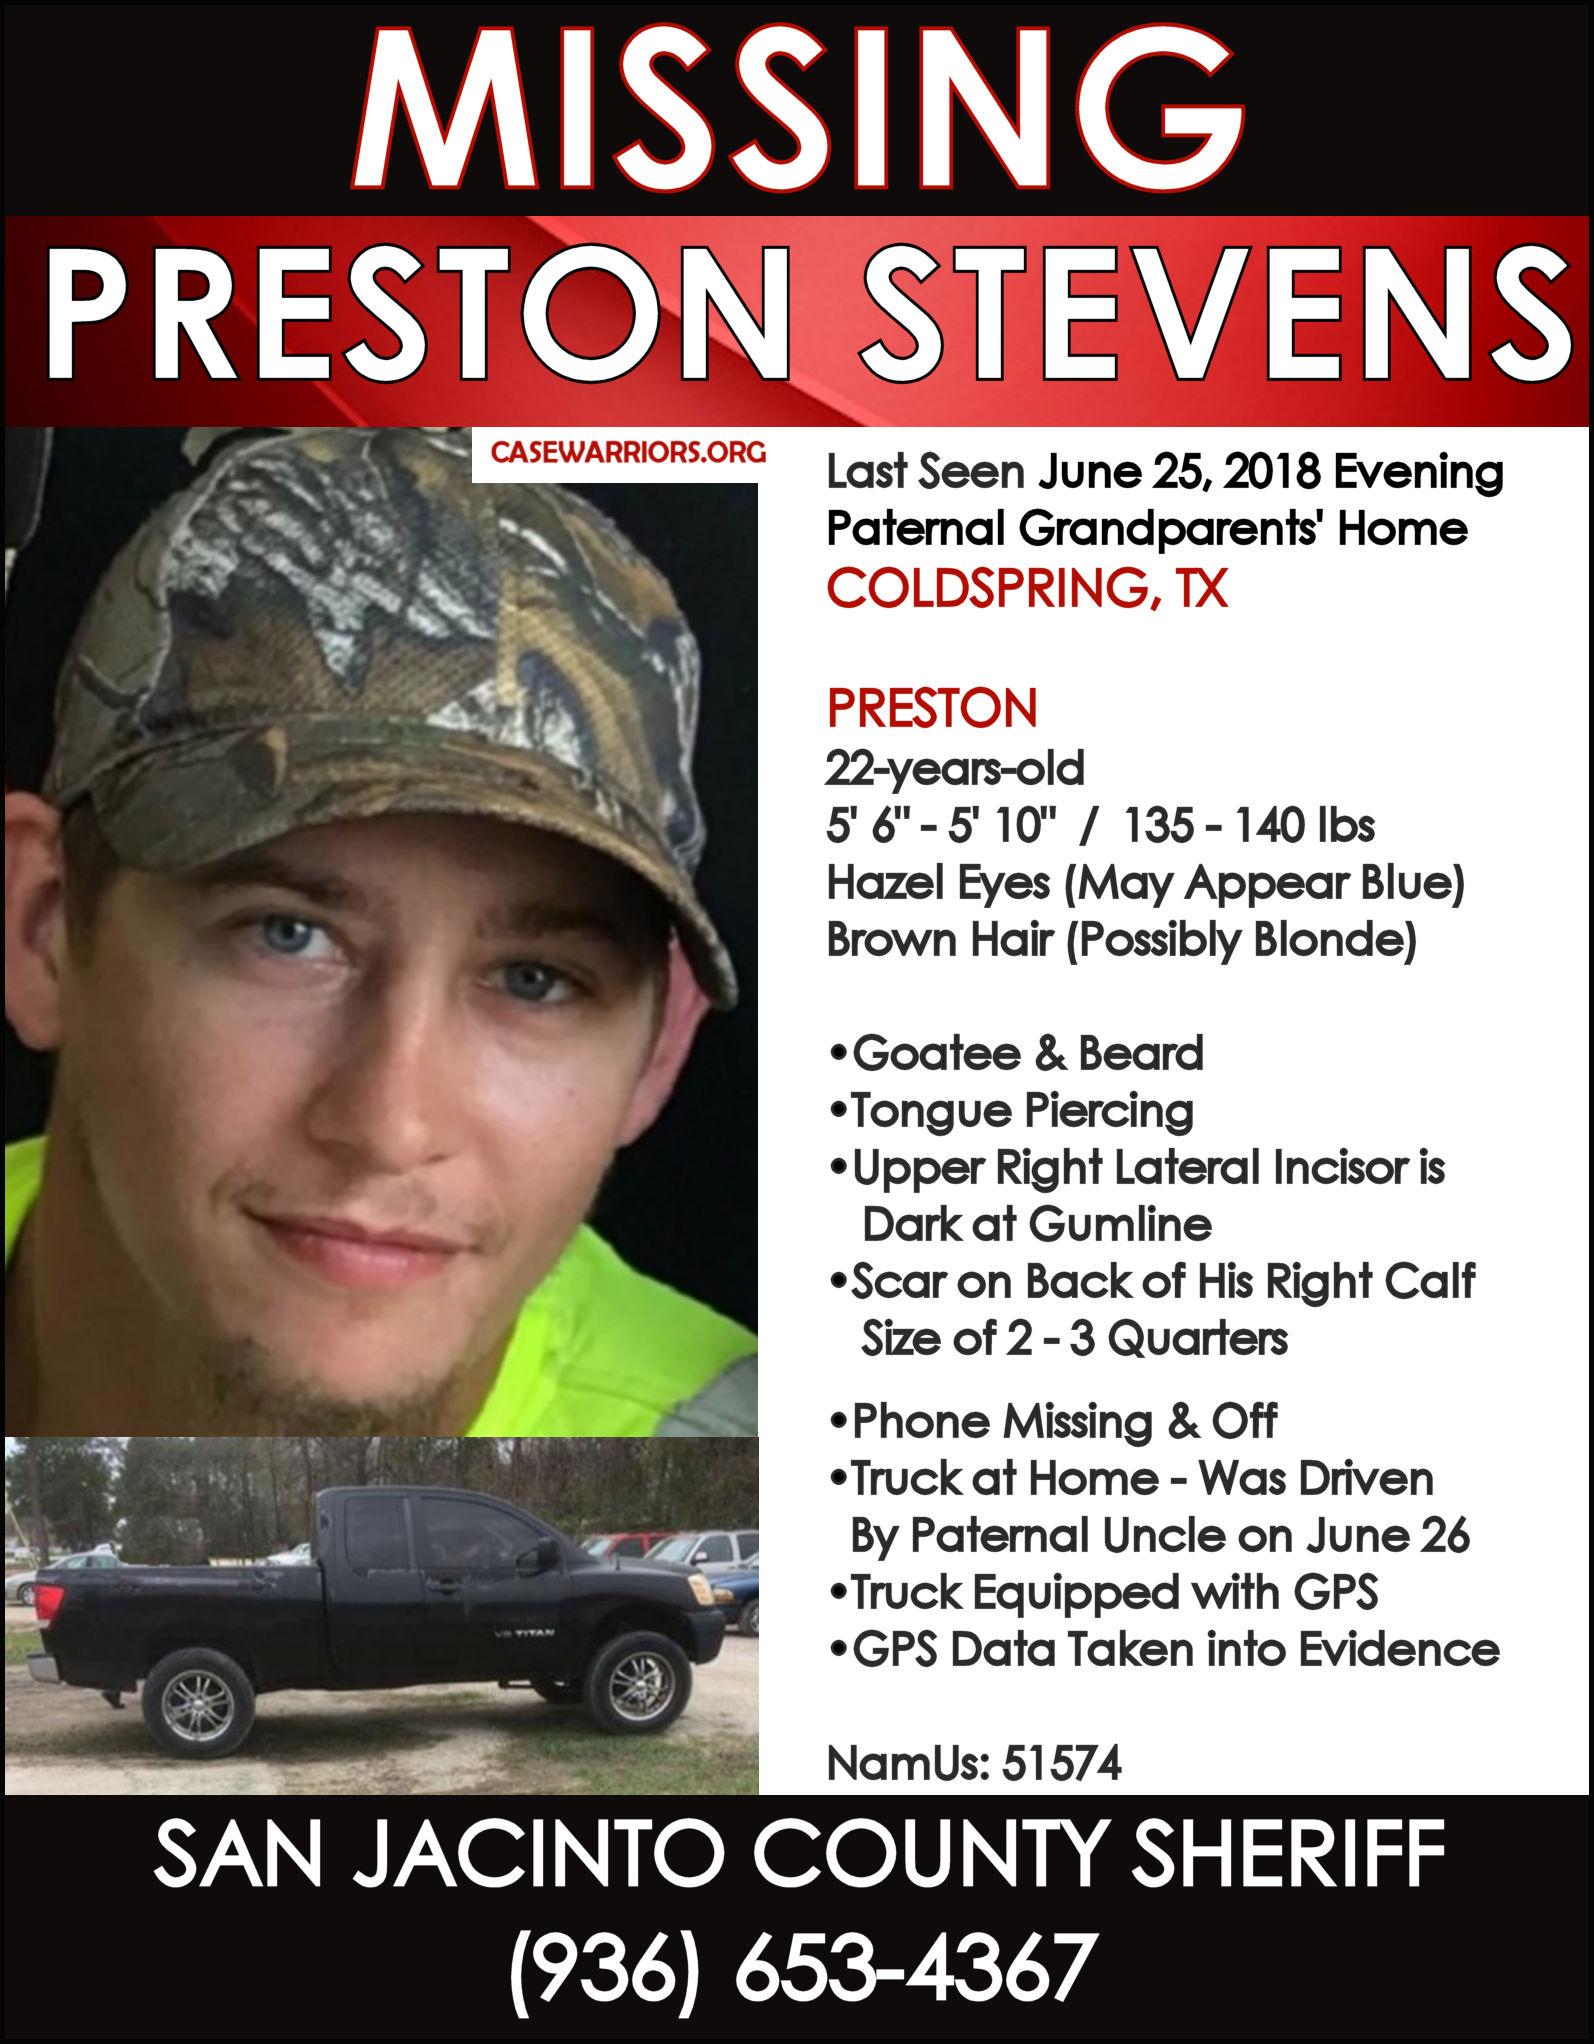 PRESTON STEVENS